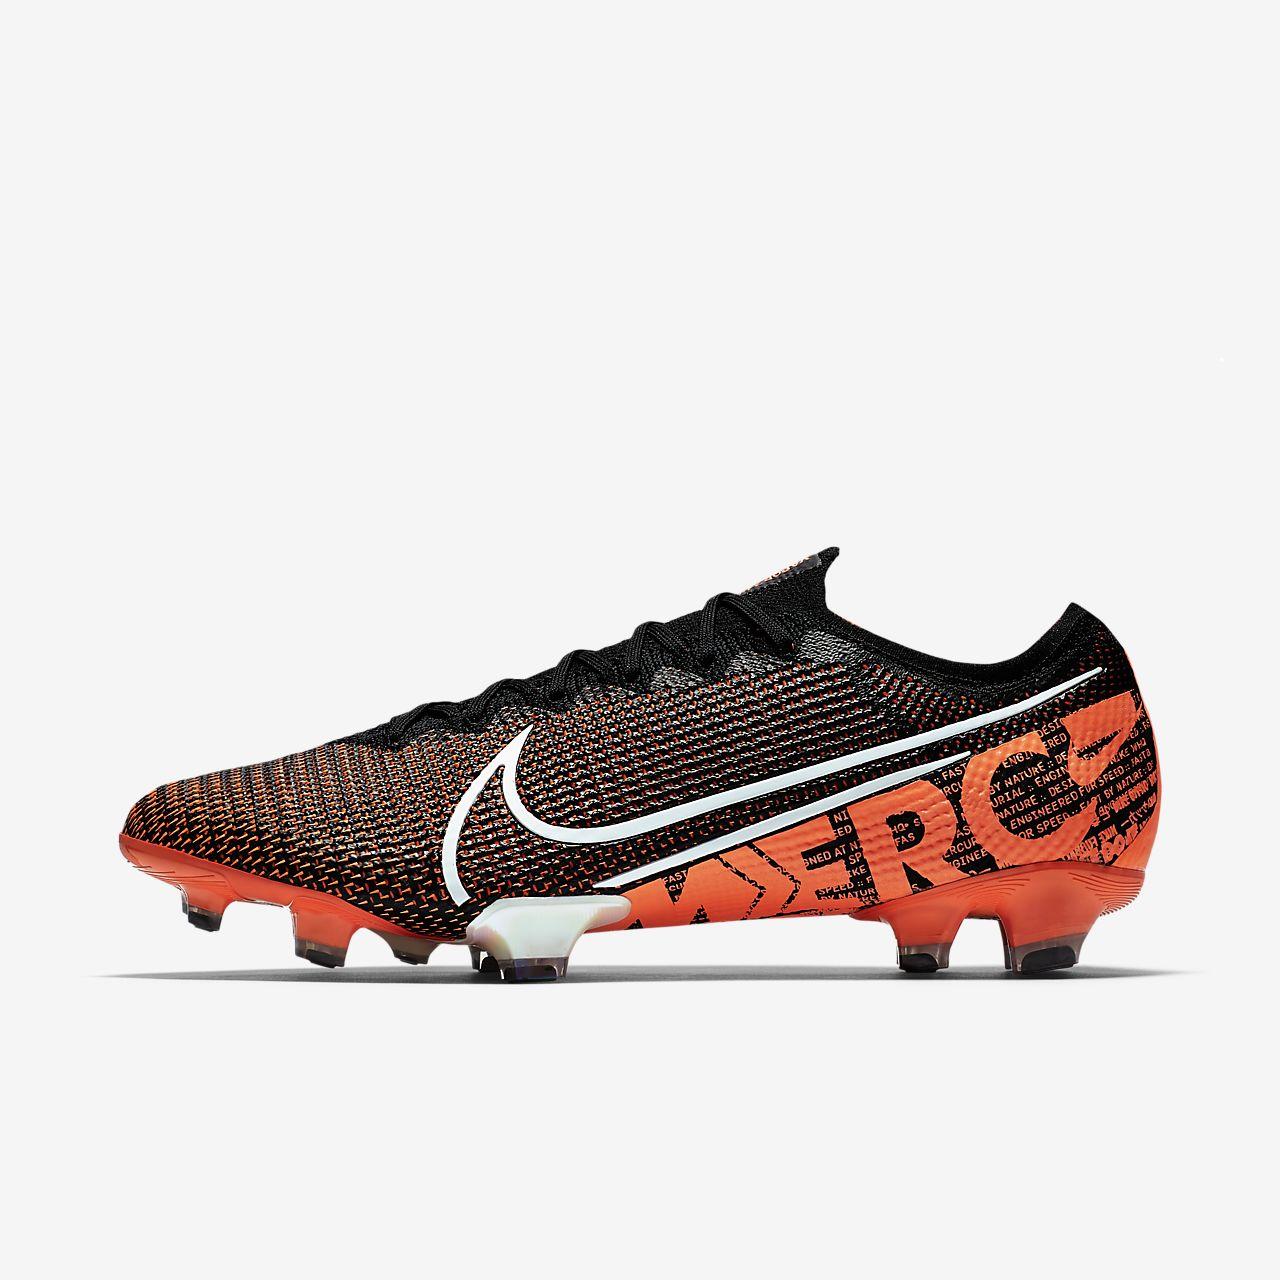 Nike Mercurial Vapor 13 Elite FG Firm-Ground Soccer Cleat